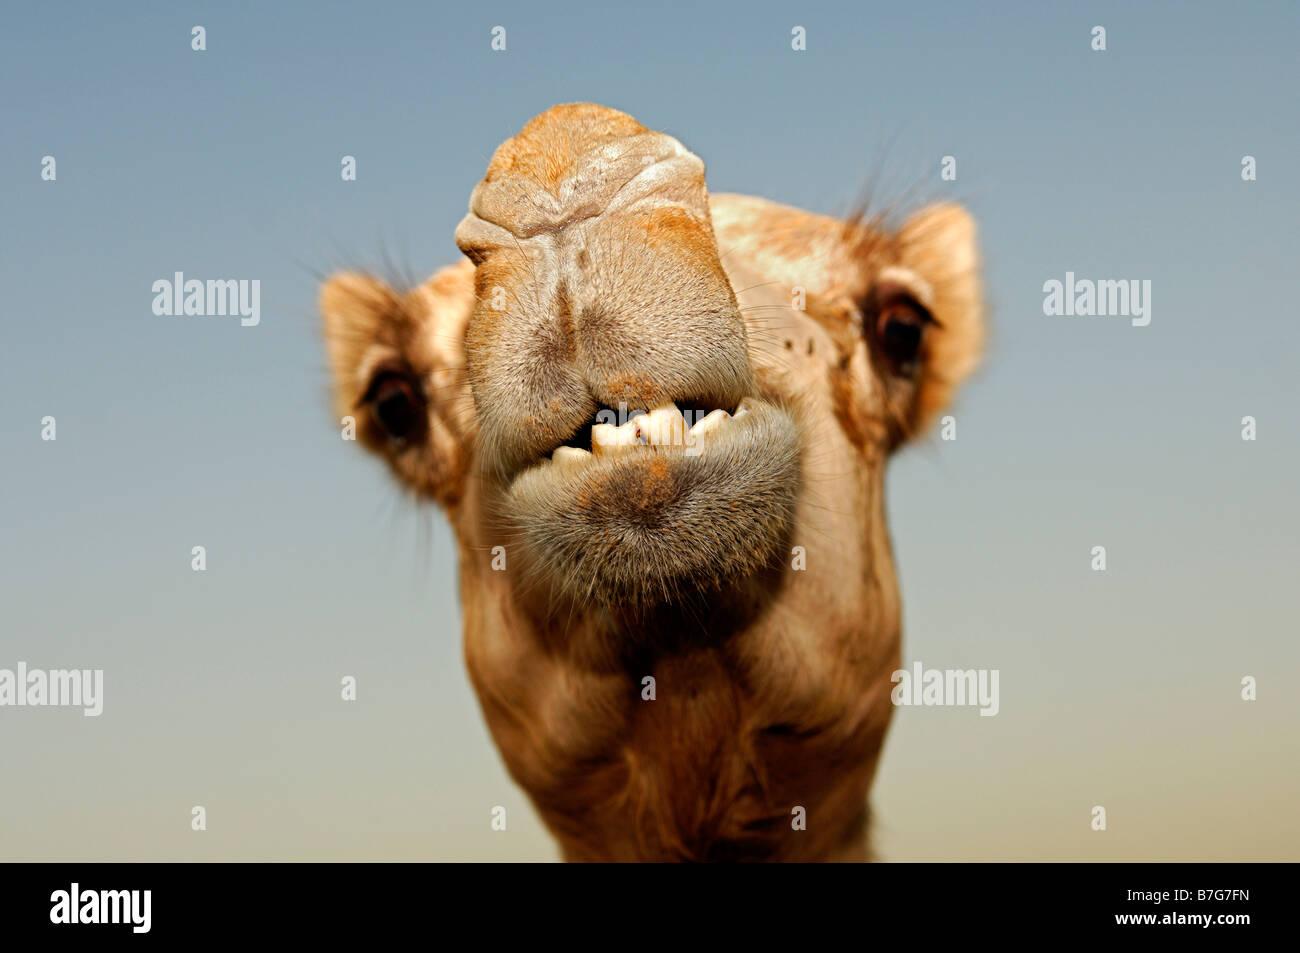 Portrait of a snarling camel, Dubai, United Arab Emirates - Stock Image